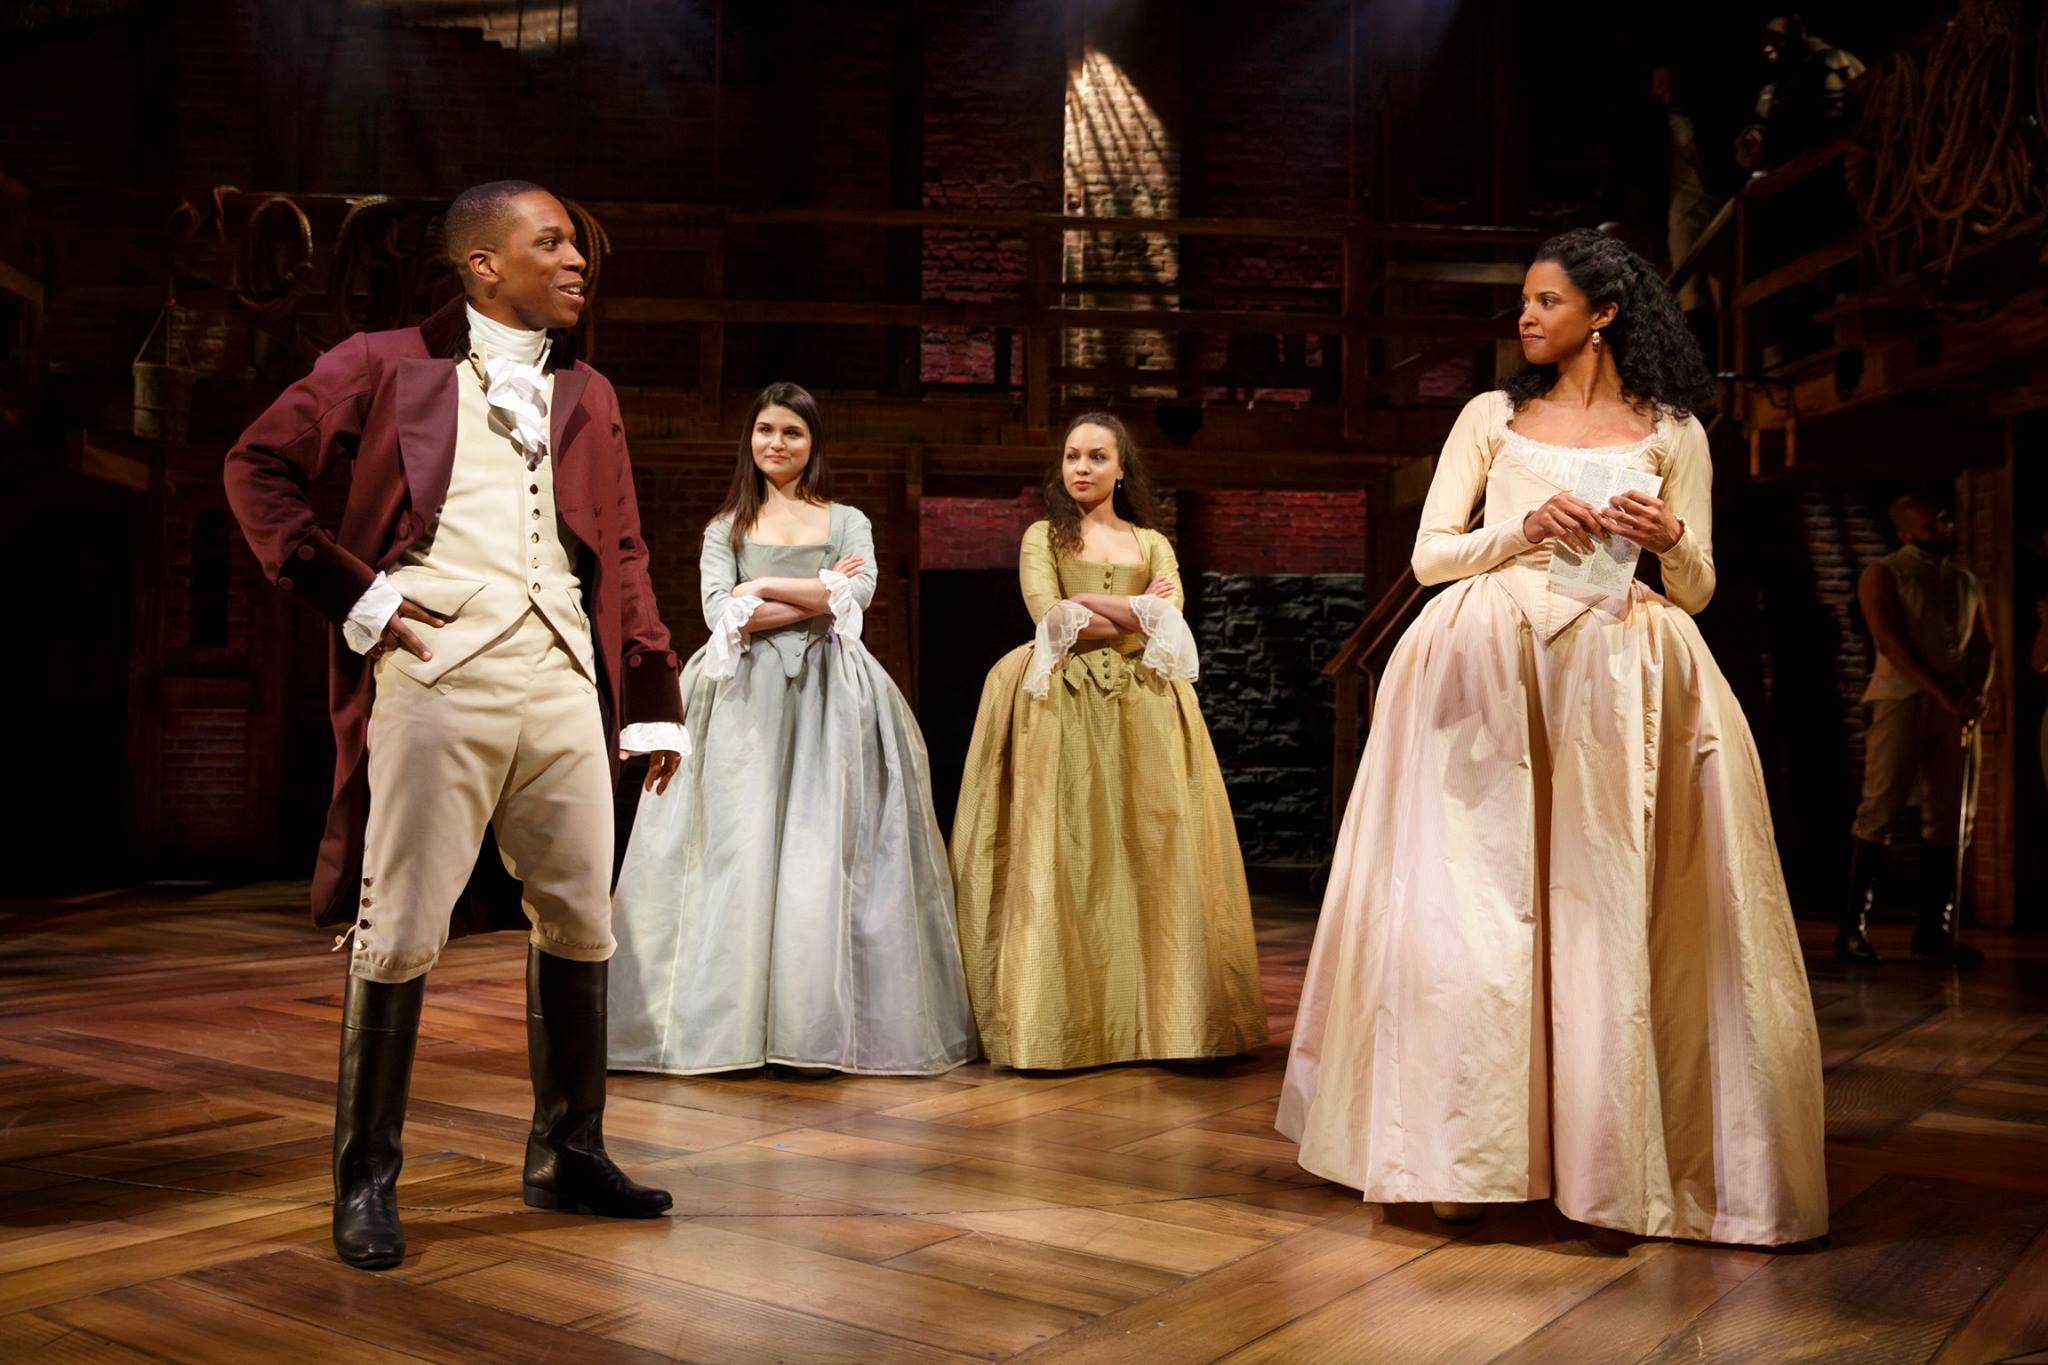 Leslie Odom Jr., as Aaron Burr, Phillipa Soo as Eliza Hamilton, Jasmine Cephas Jones, and Renée Elise Goldsberry as members of the Schuyler family.